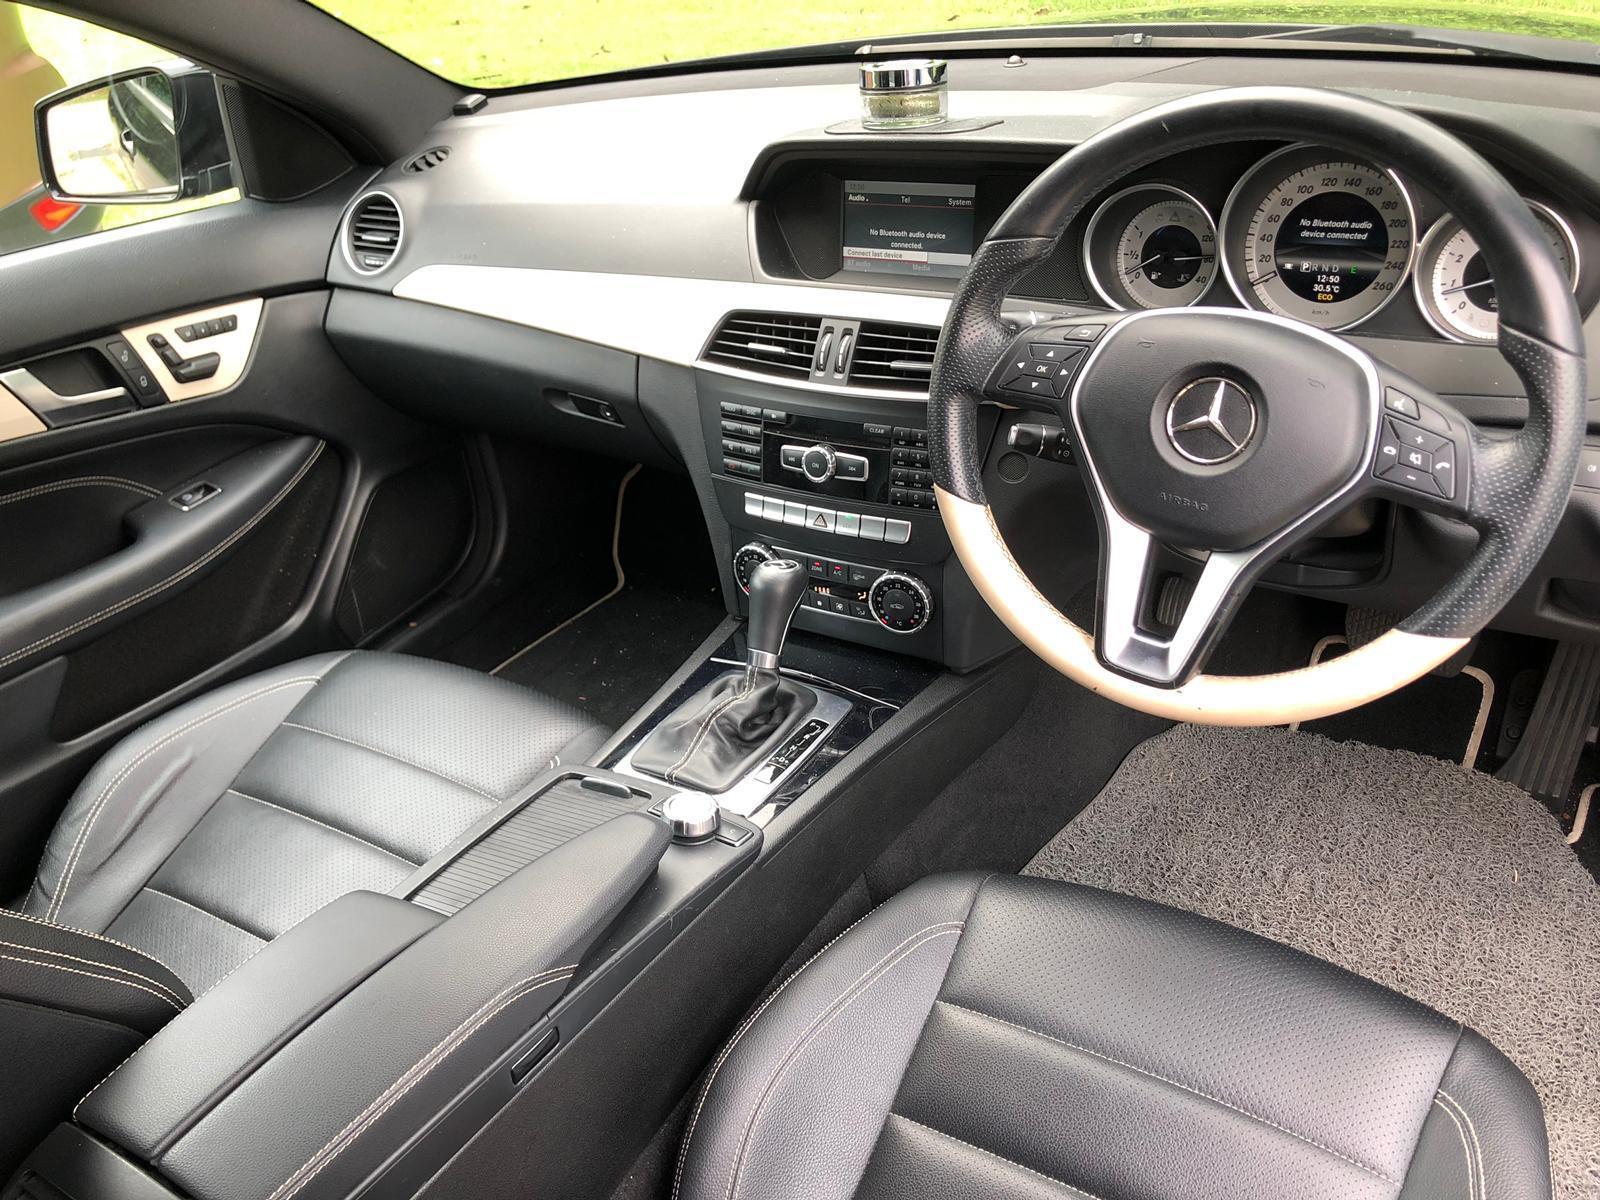 Mercedes-Benz C180 Saloon Auto